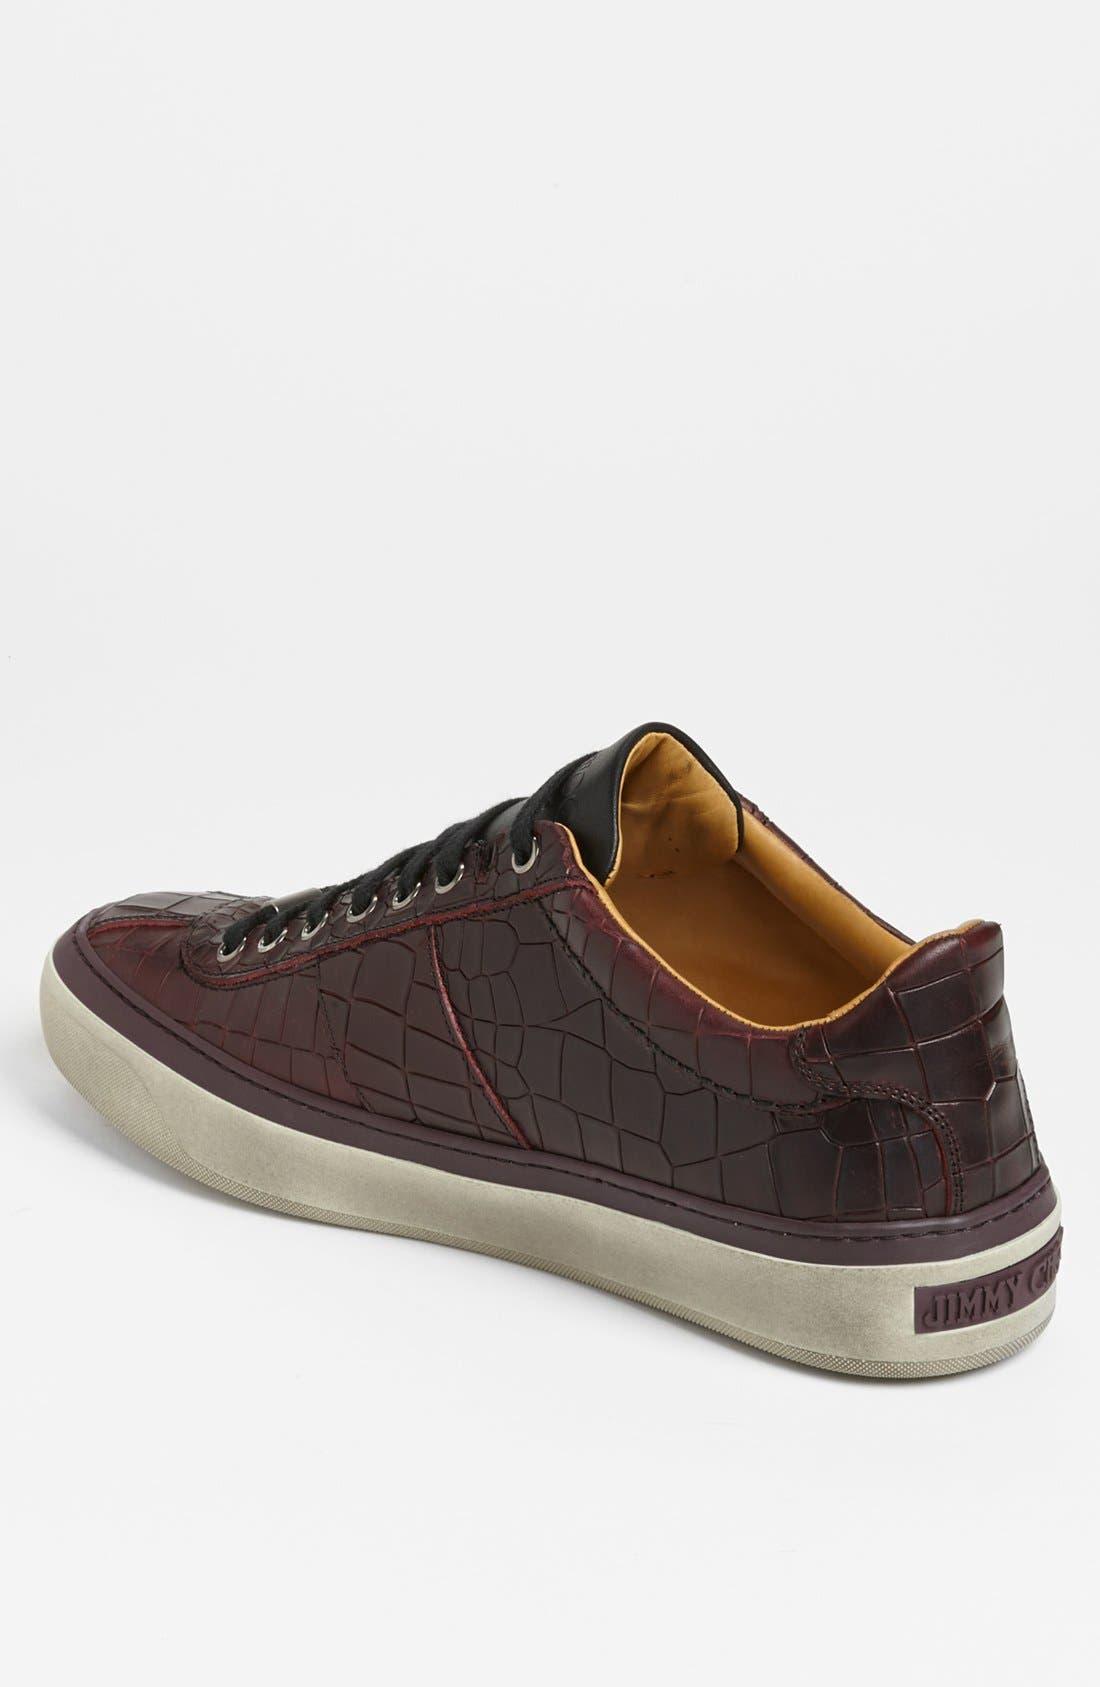 JIMMY CHOO,                             'Portman' Sneaker,                             Alternate thumbnail 4, color,                             001